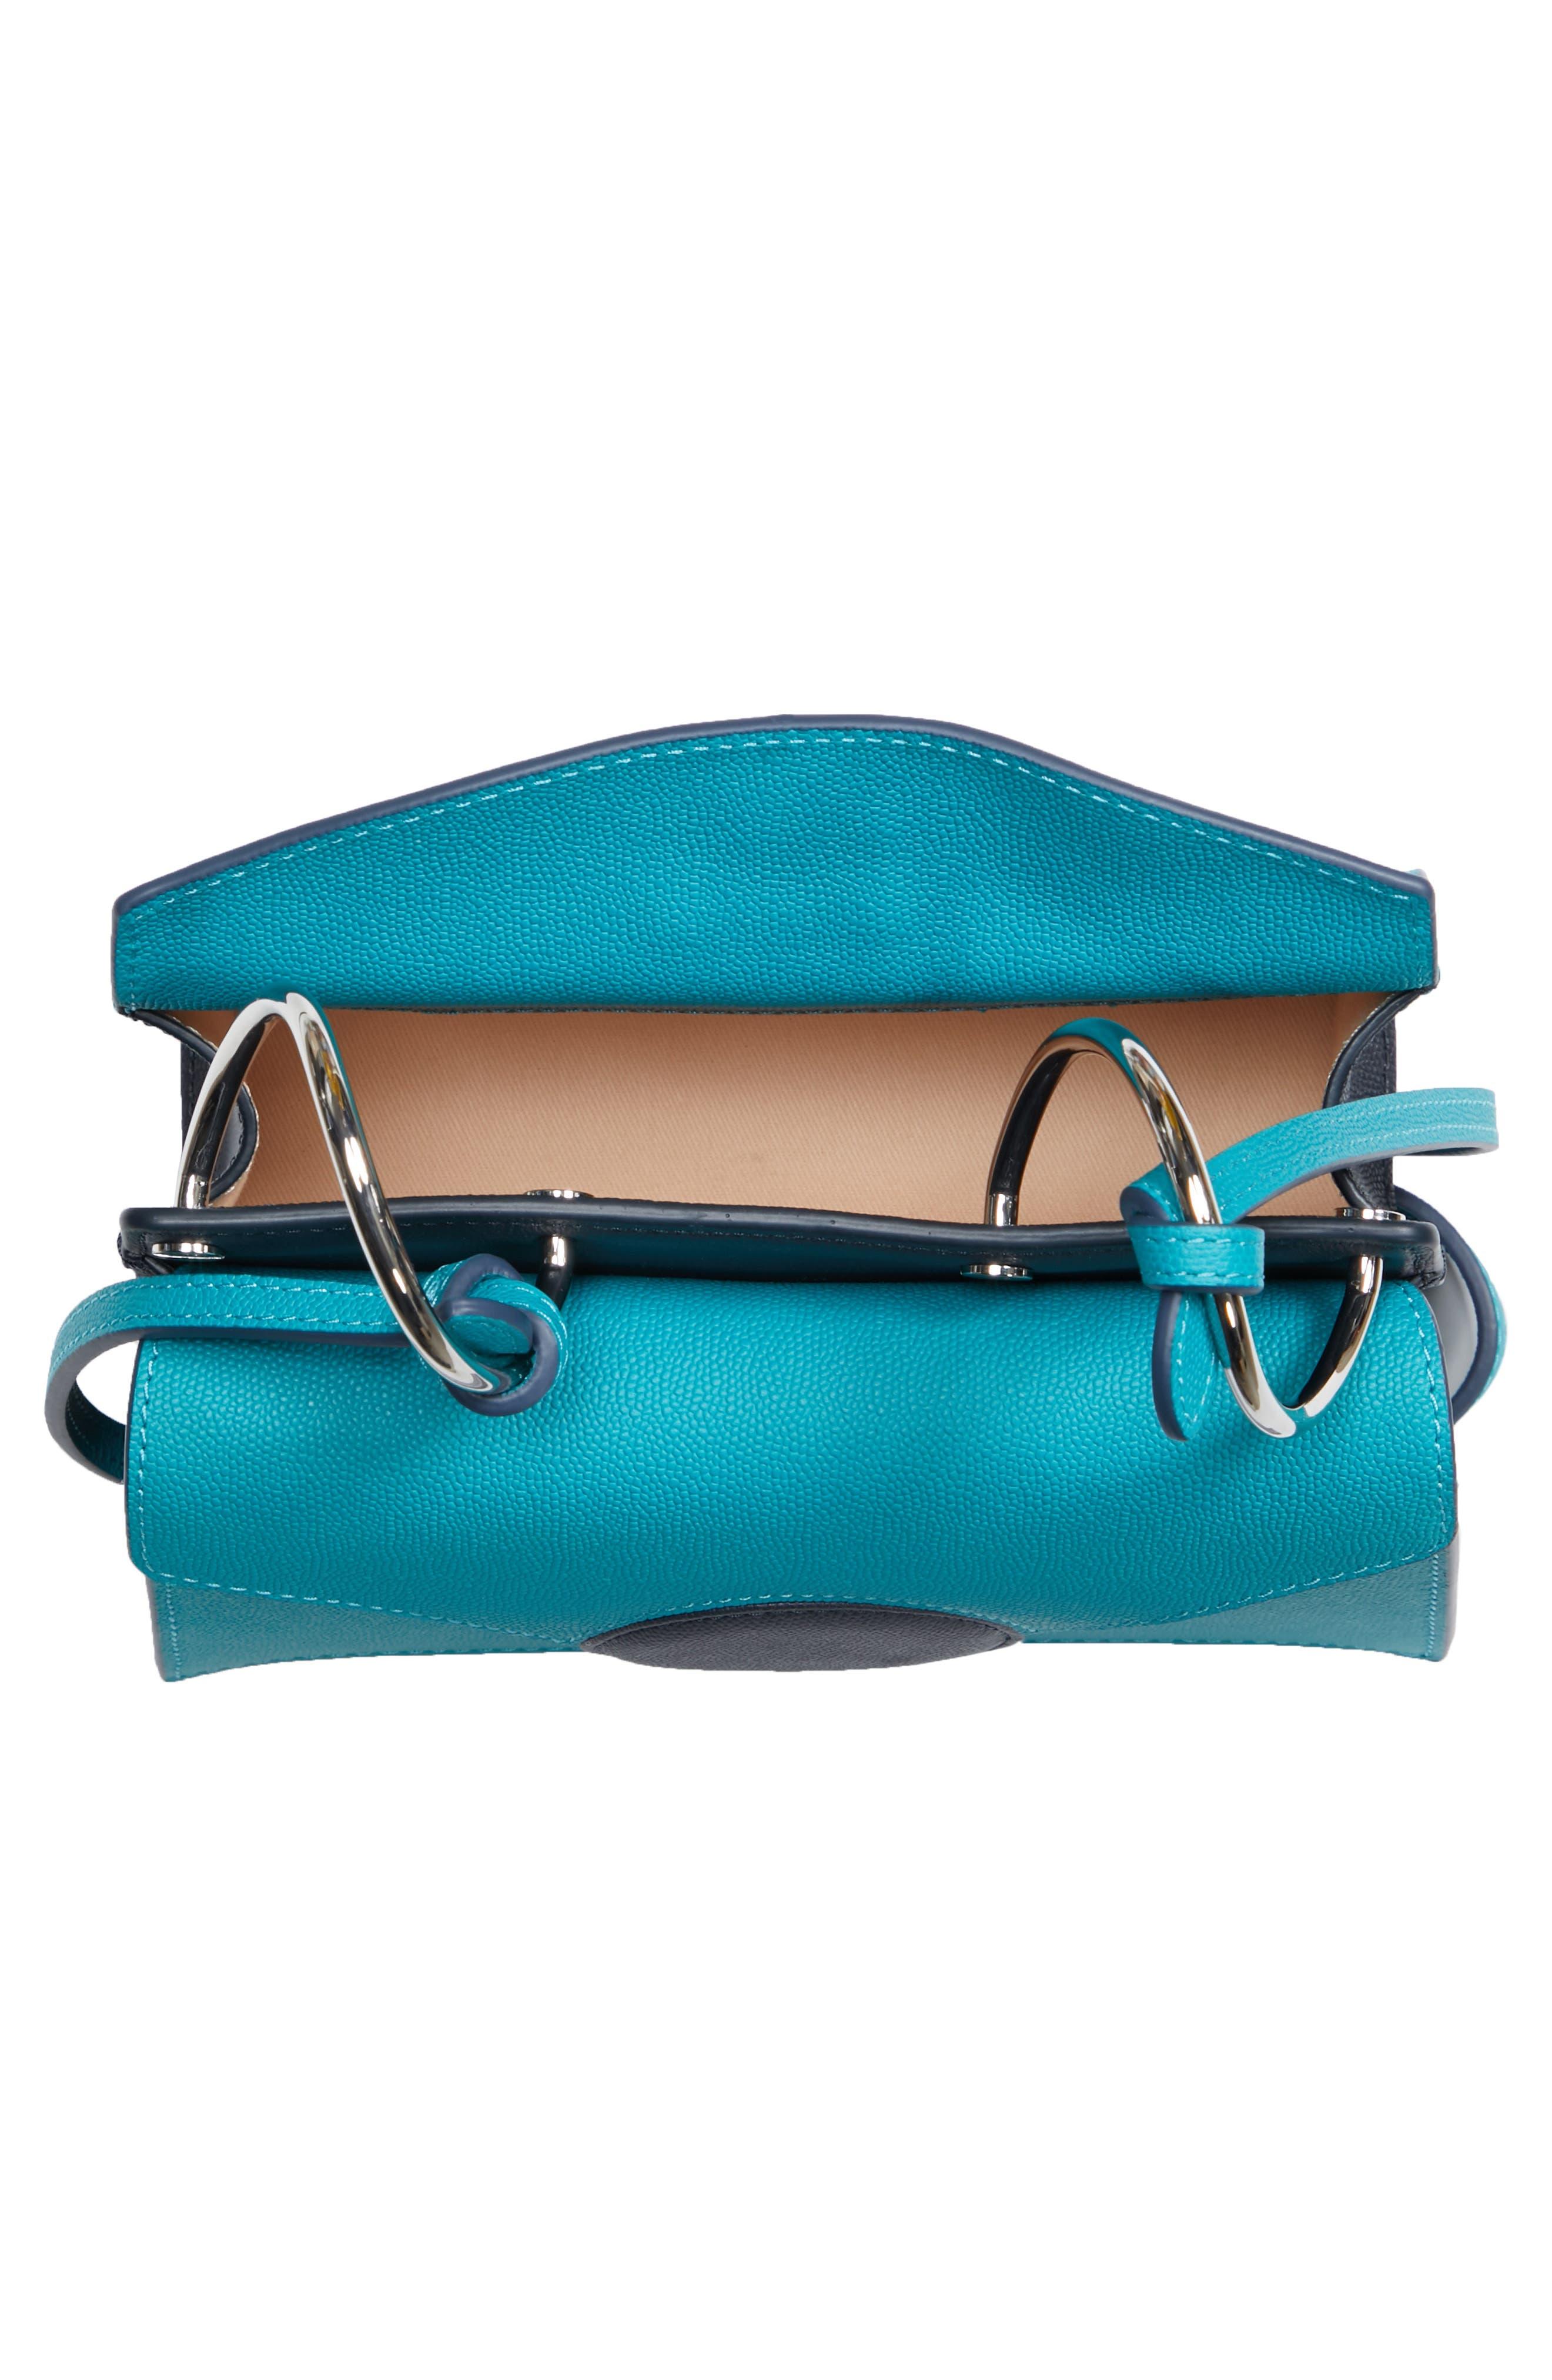 Mini Phoebe Leather Bag,                             Alternate thumbnail 4, color,                             TURQUOISE